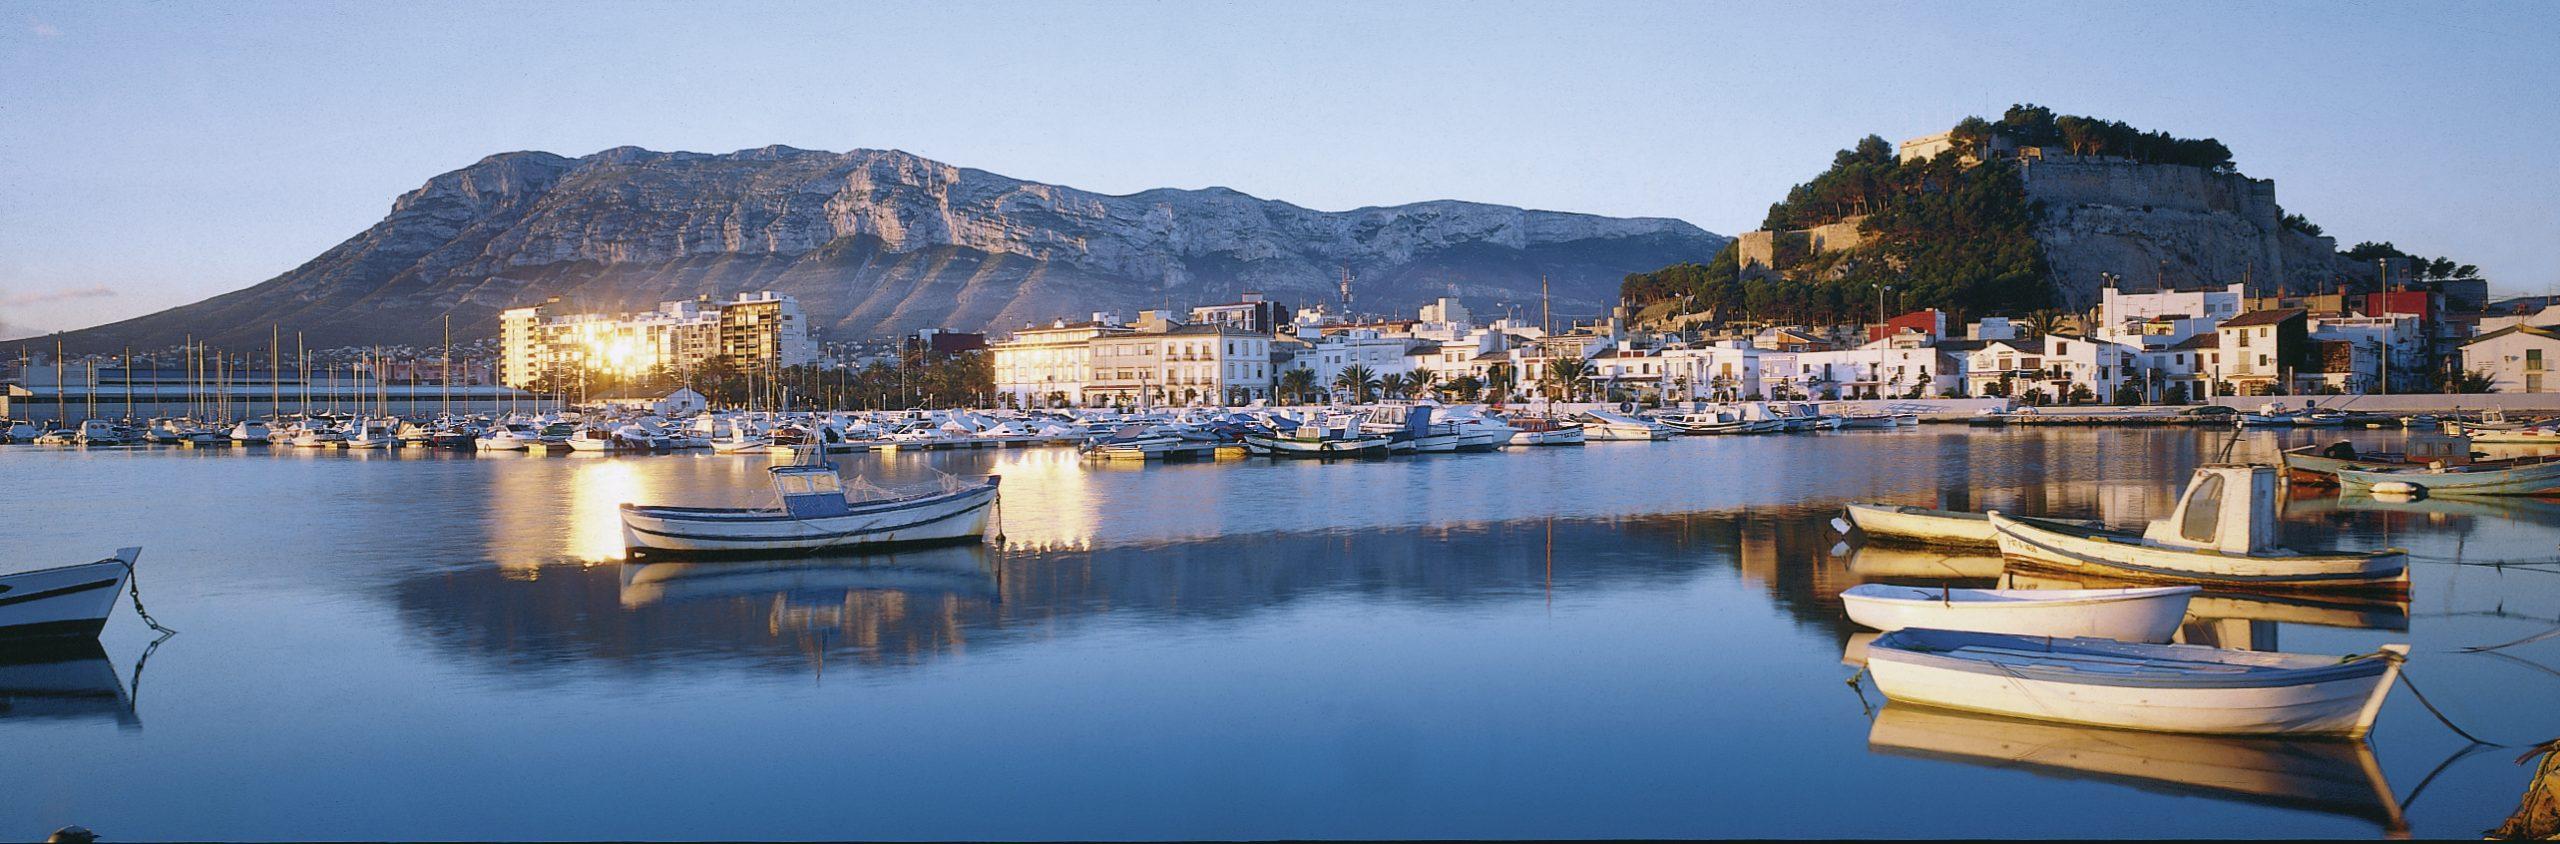 hotel-denia-chamarel-puerto